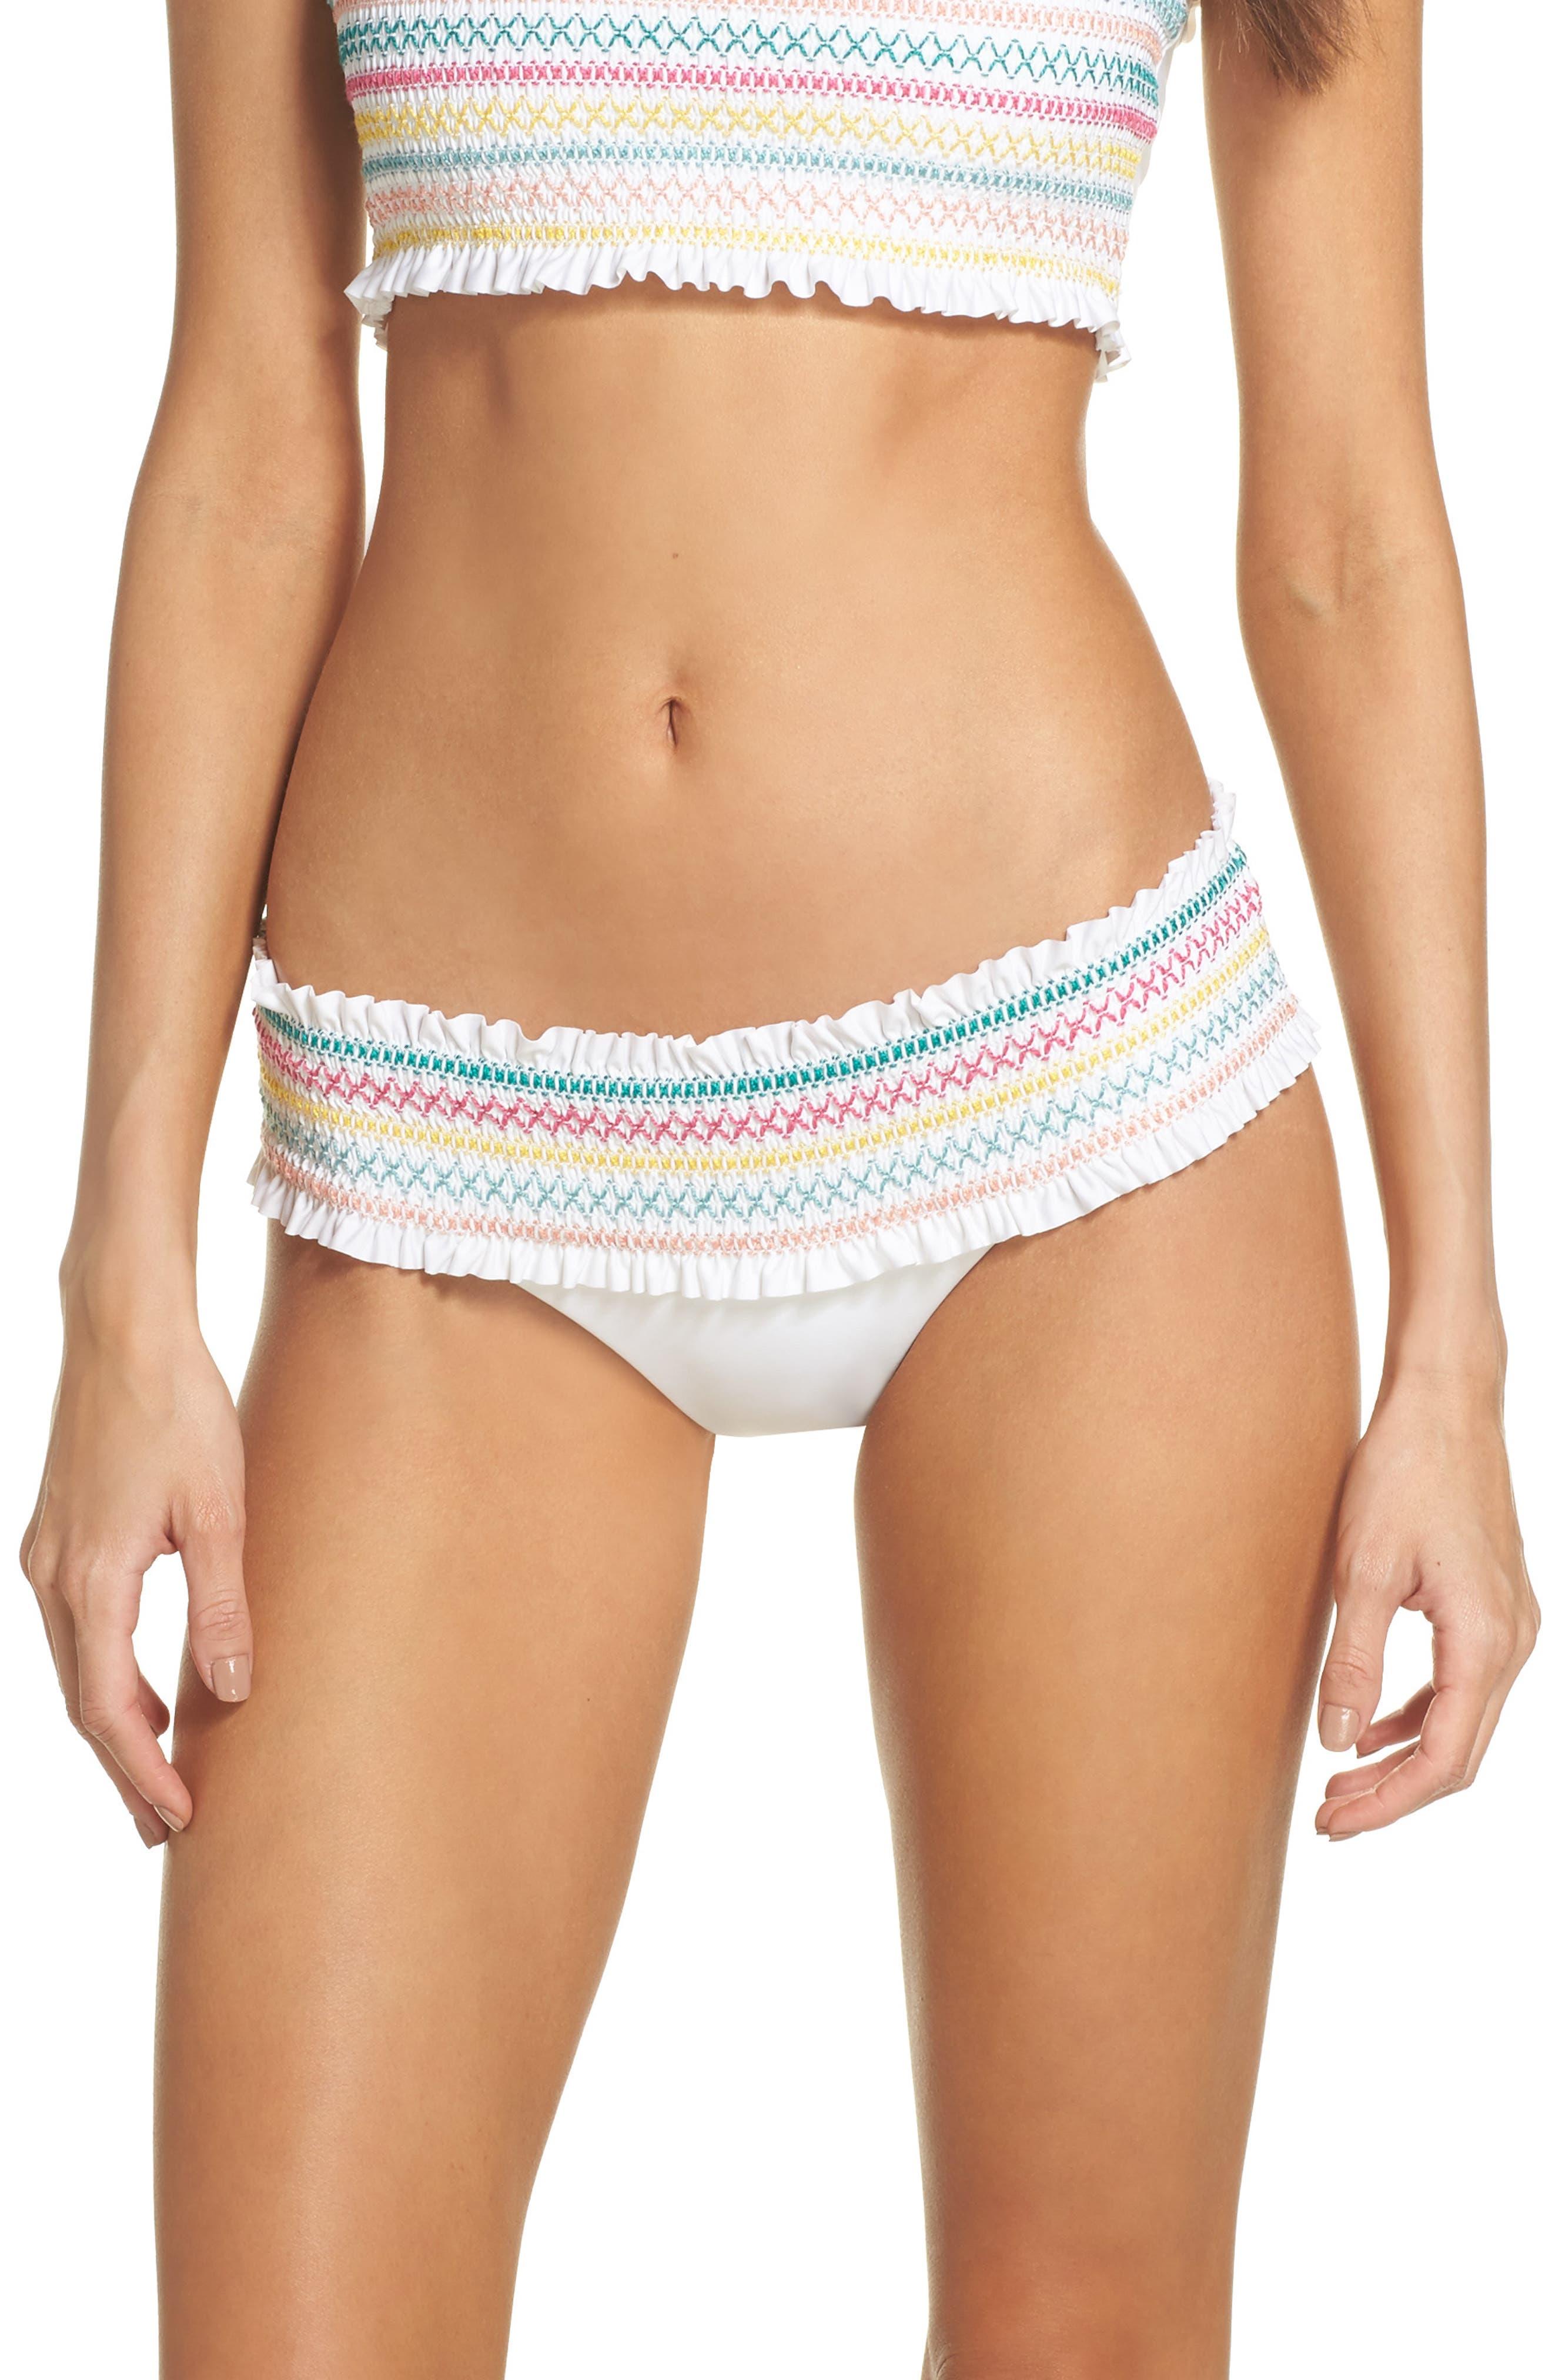 Isabella Rose Crystal Cove Smocked Bikini Bottoms